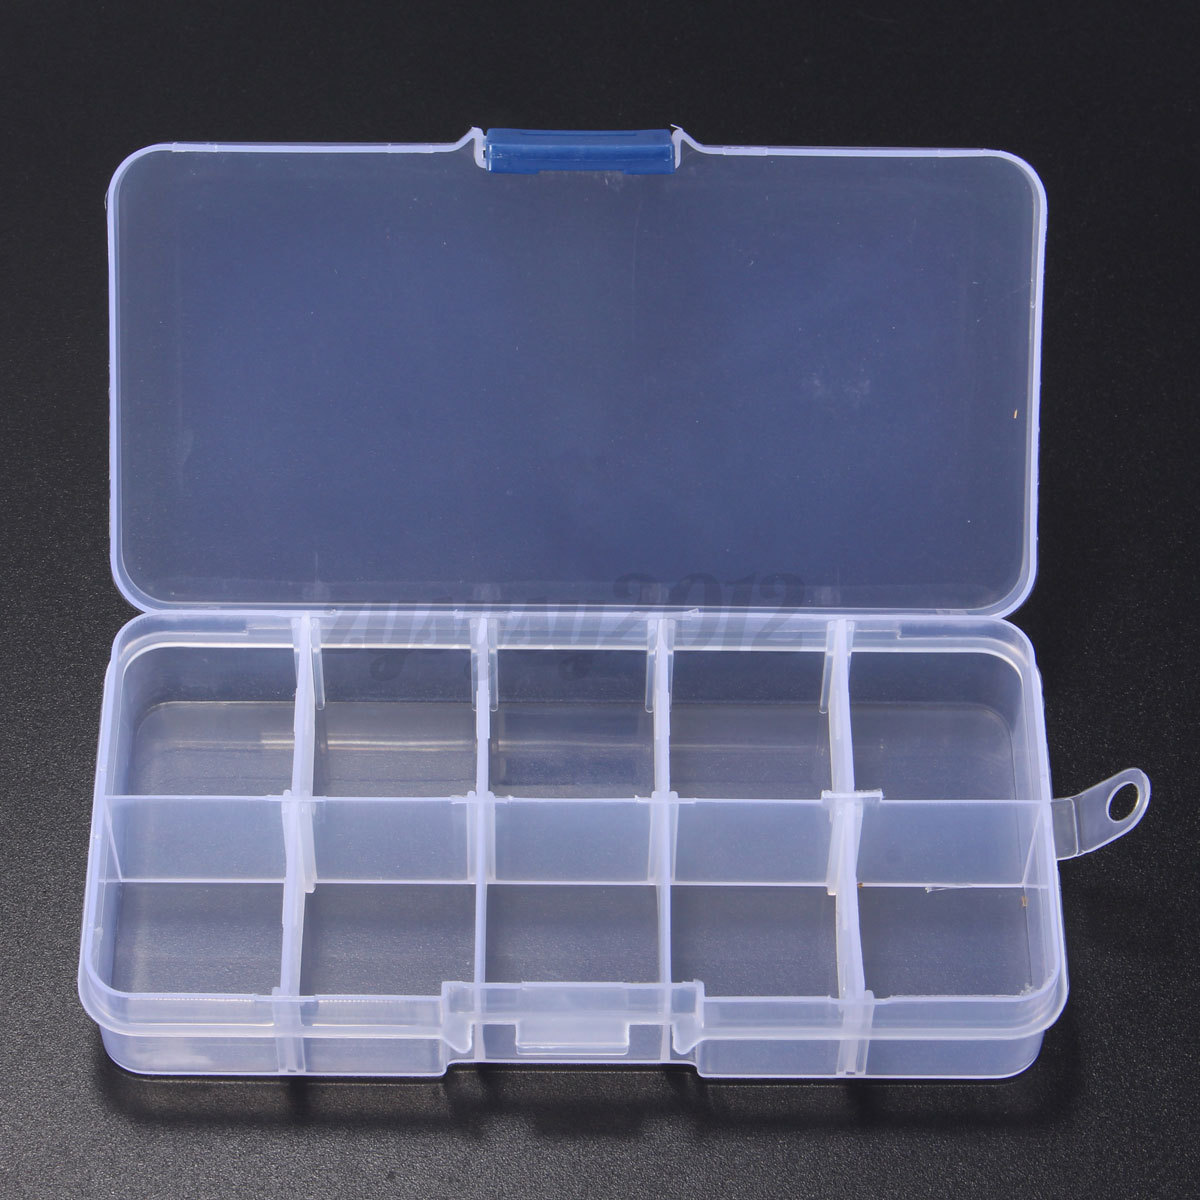 10 36 grid slot plastic jewelry adjustable storage box